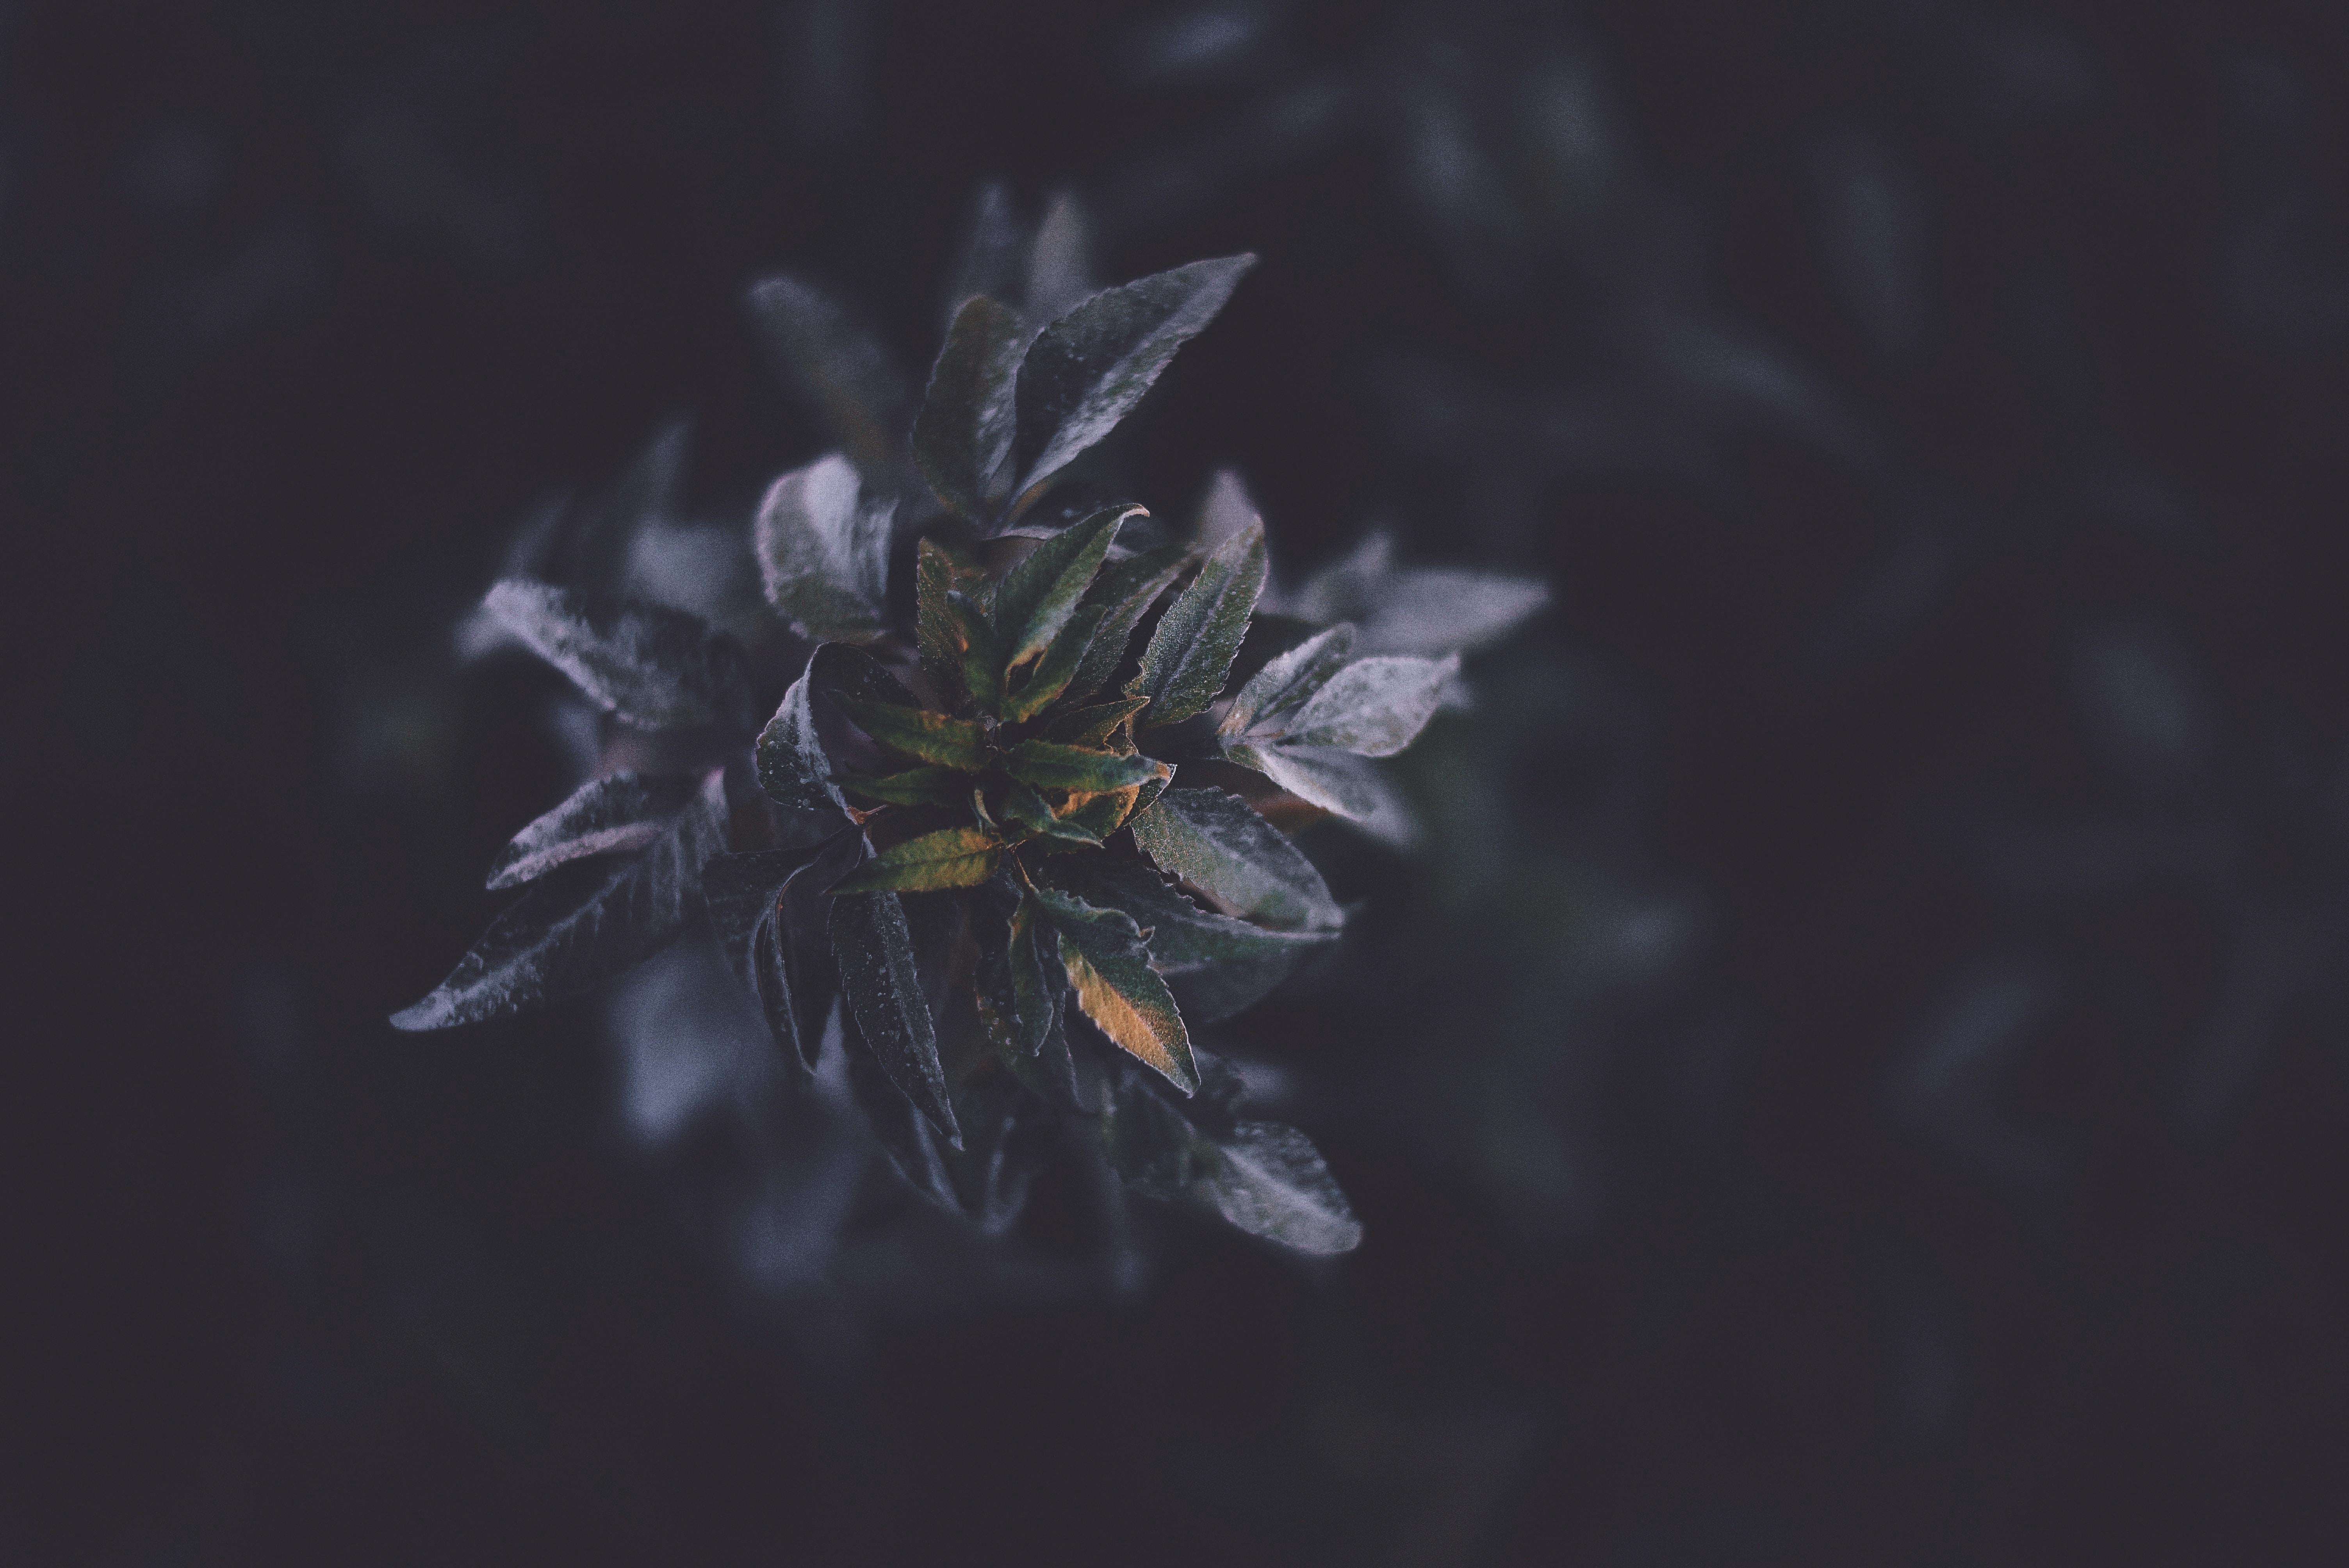 A macro shot of dark-colored leaves.